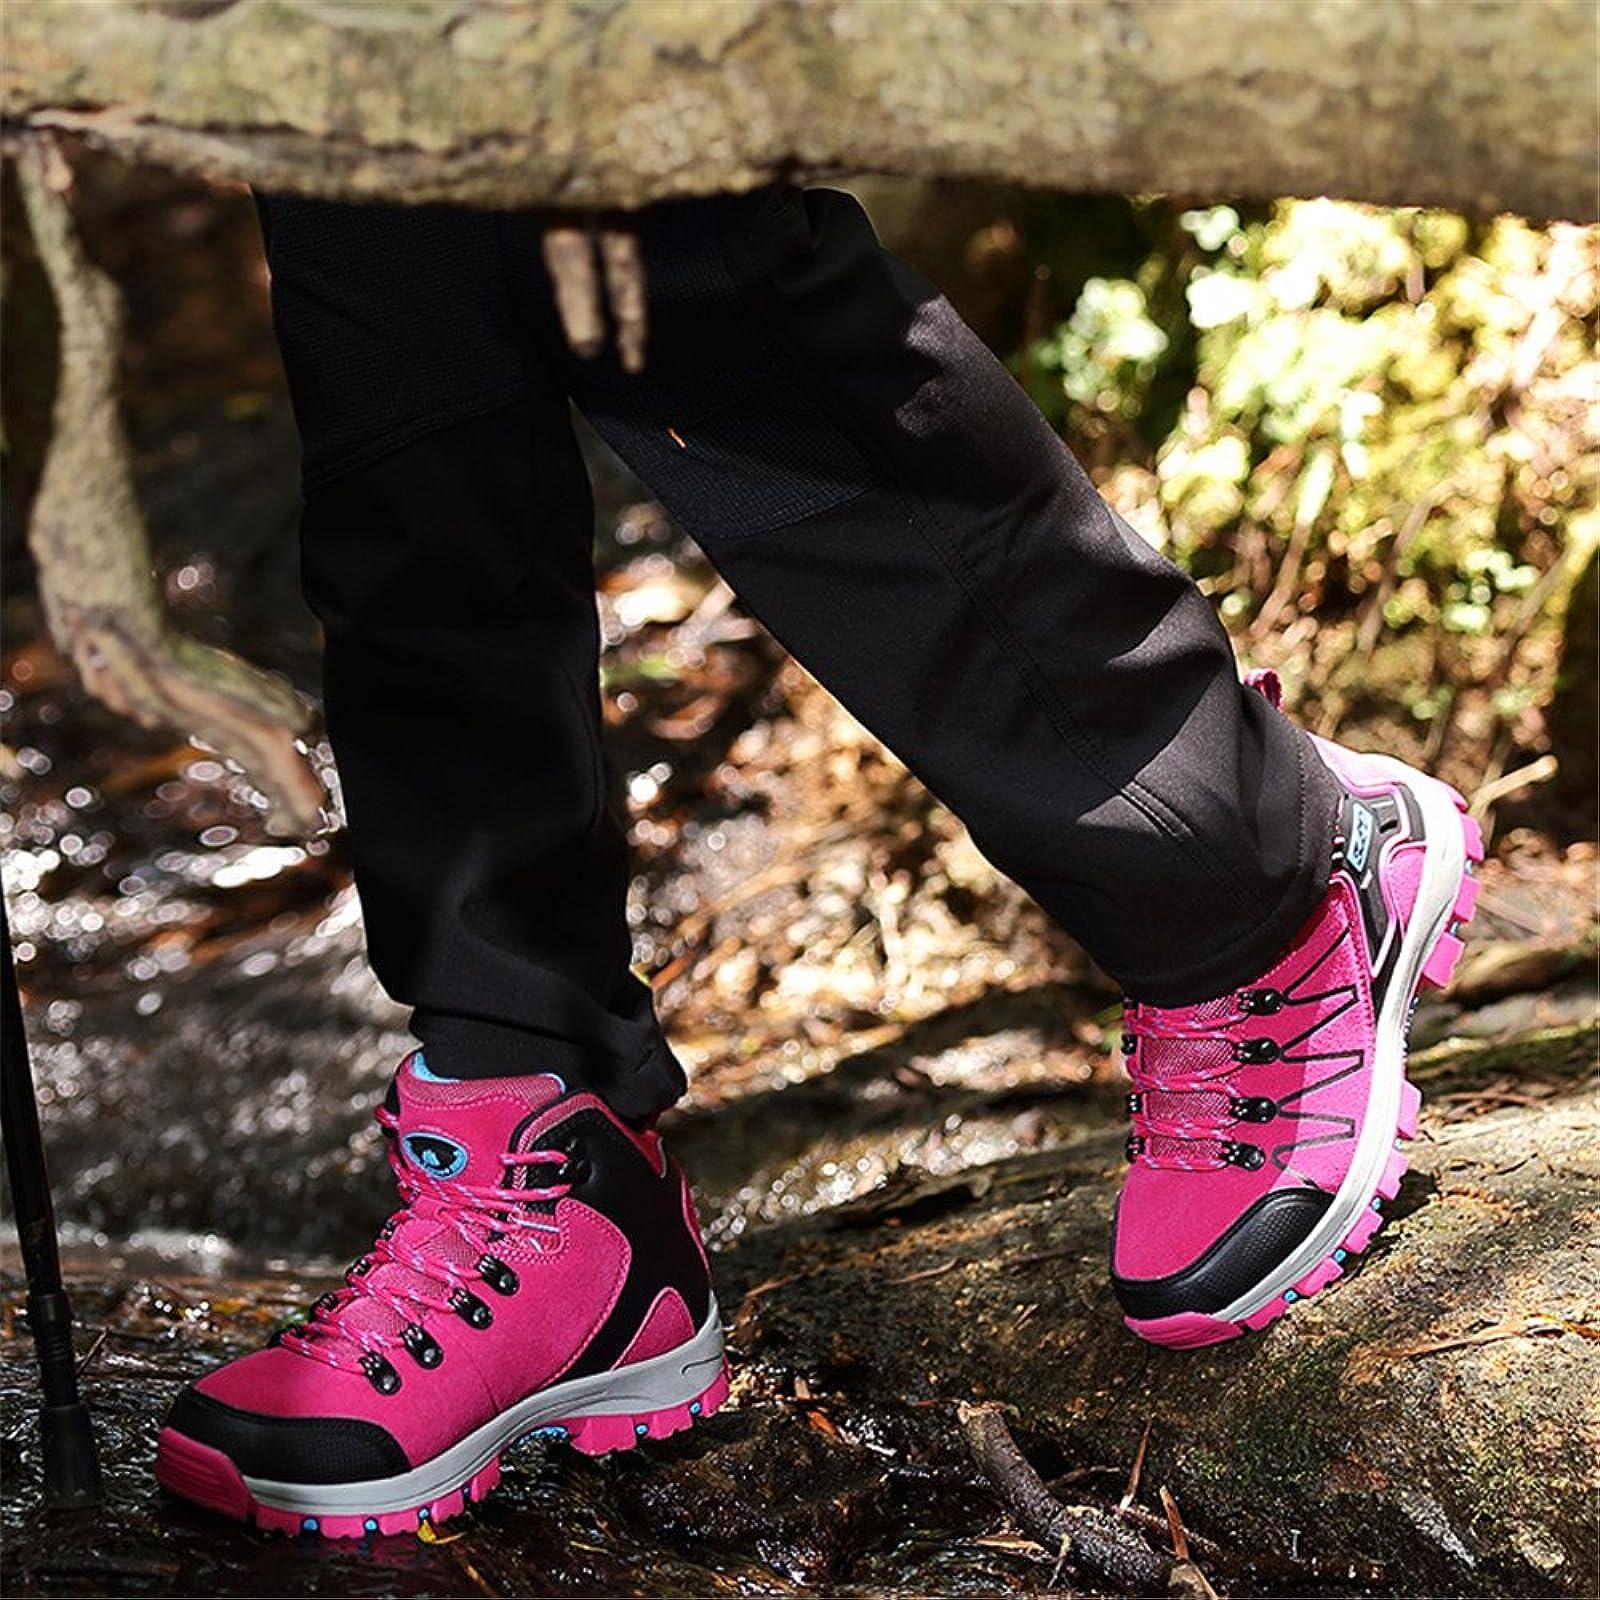 FEOZYZ Womens Hiking Boots Trekking Shoes Anti- QLMXZY's 1008 - 7